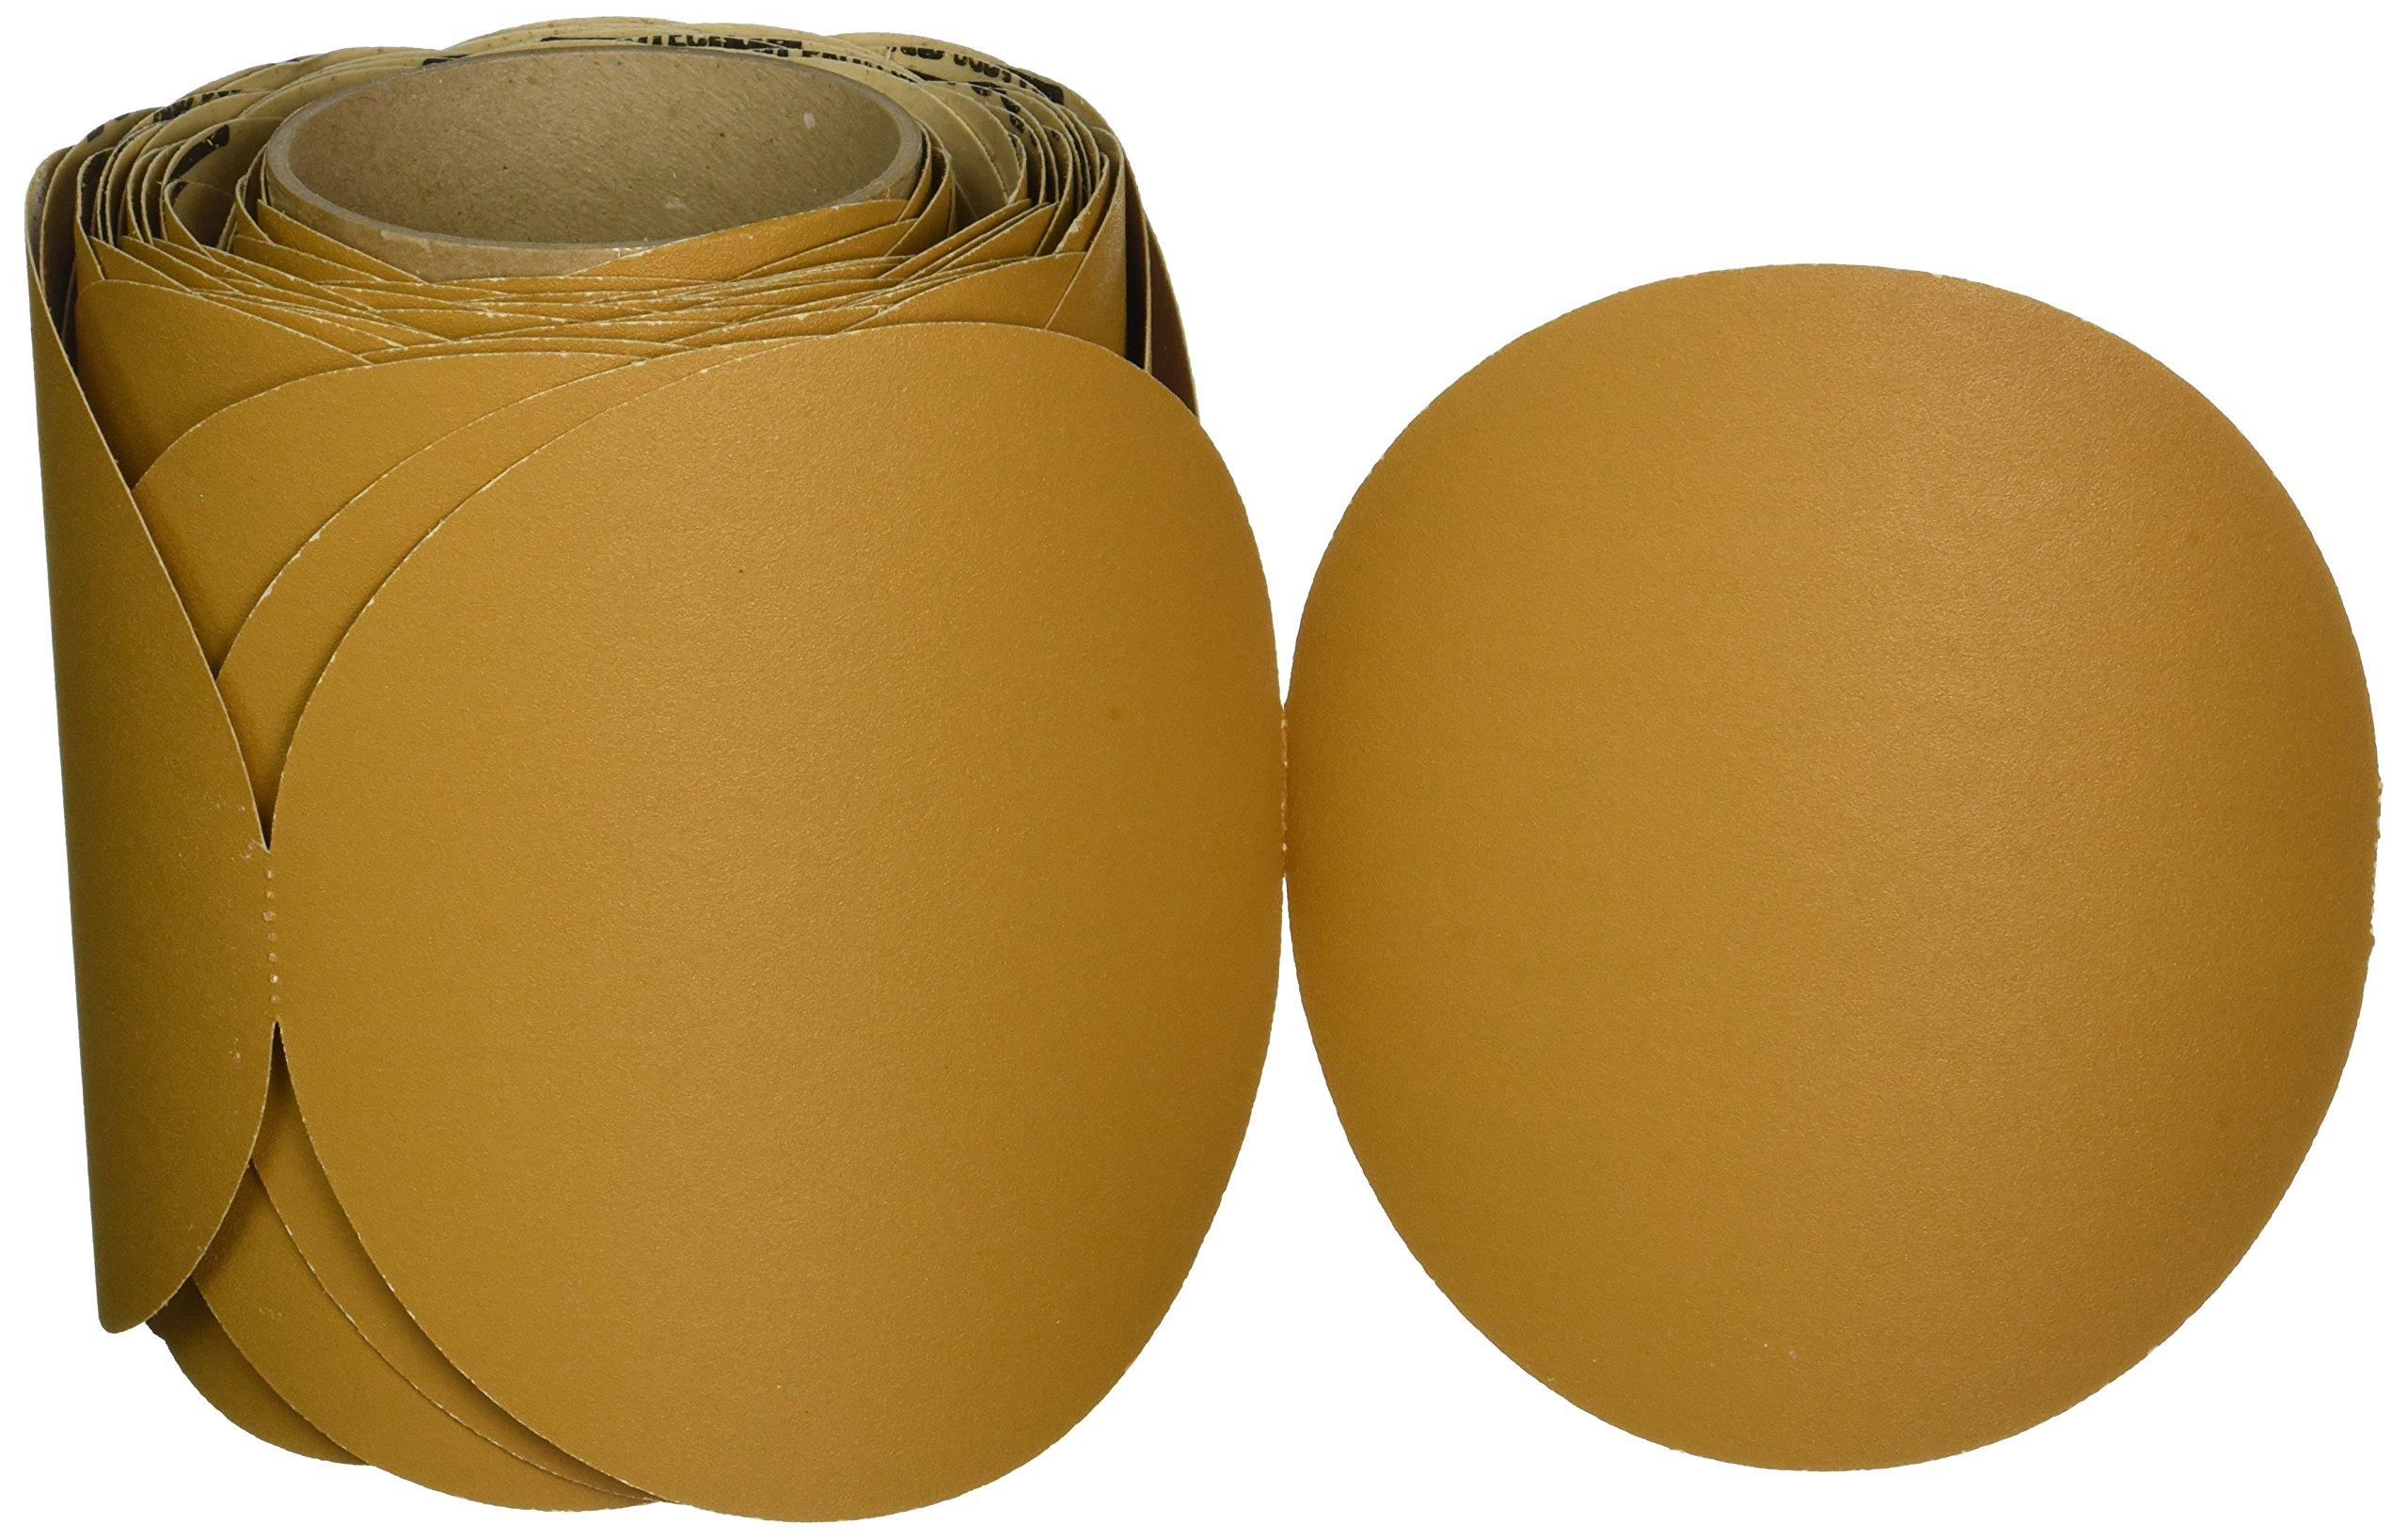 "3M Stikit Paper Disc Roll 363I, PSA Attachment, Aluminum Oxide, 6"" Diameter, 180 Grit (Roll of 100)"